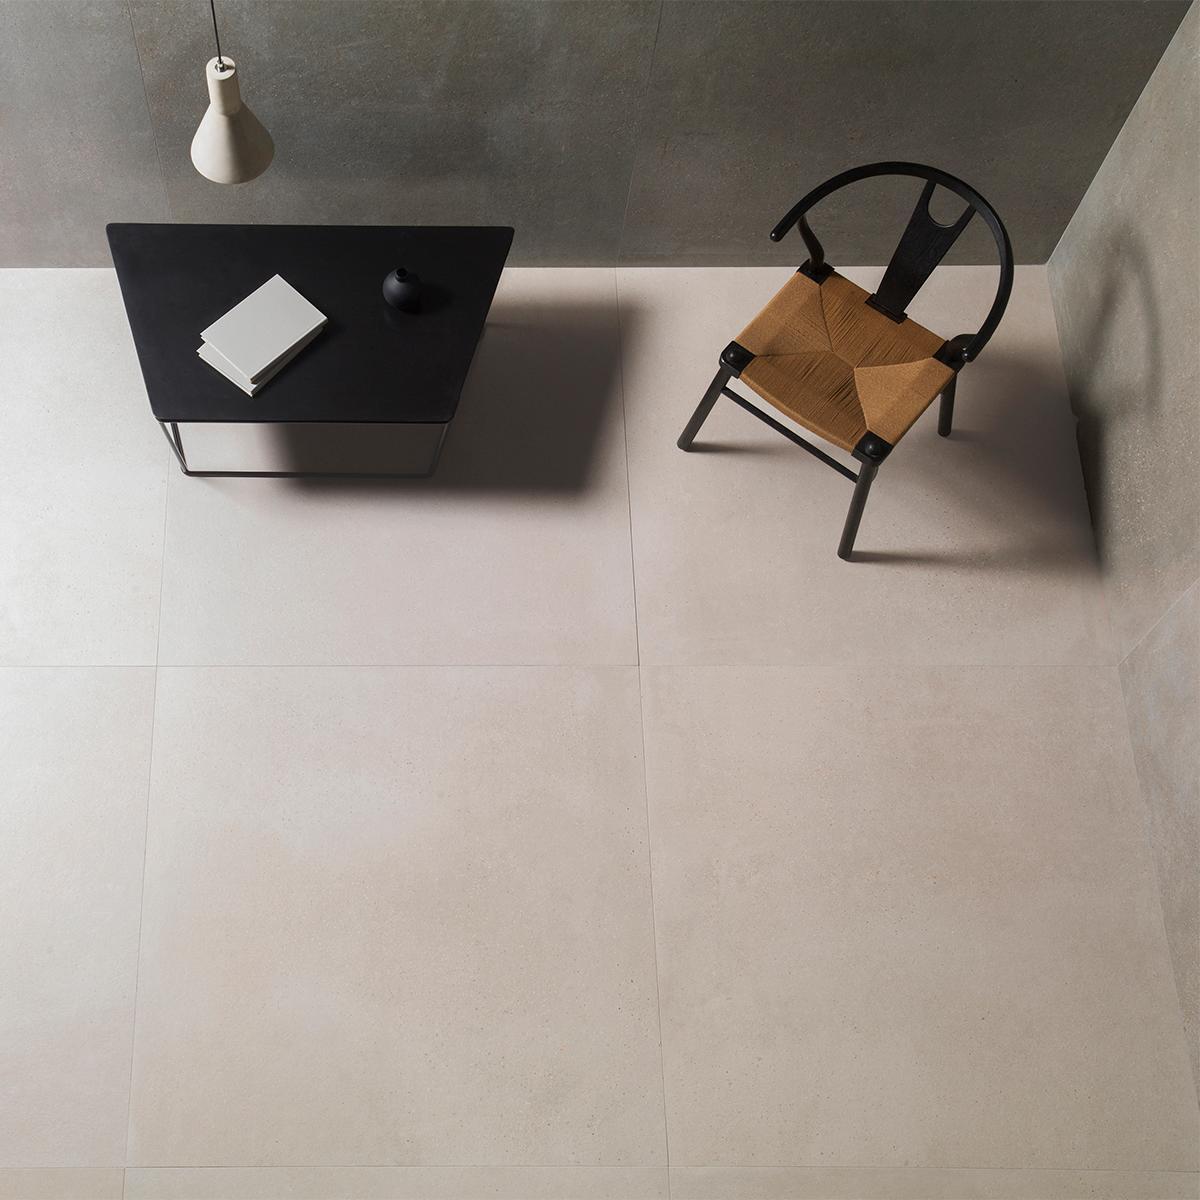 Porcelanato Bottega Caliza Beige Mate - 120X120 cm - 1.44 m2